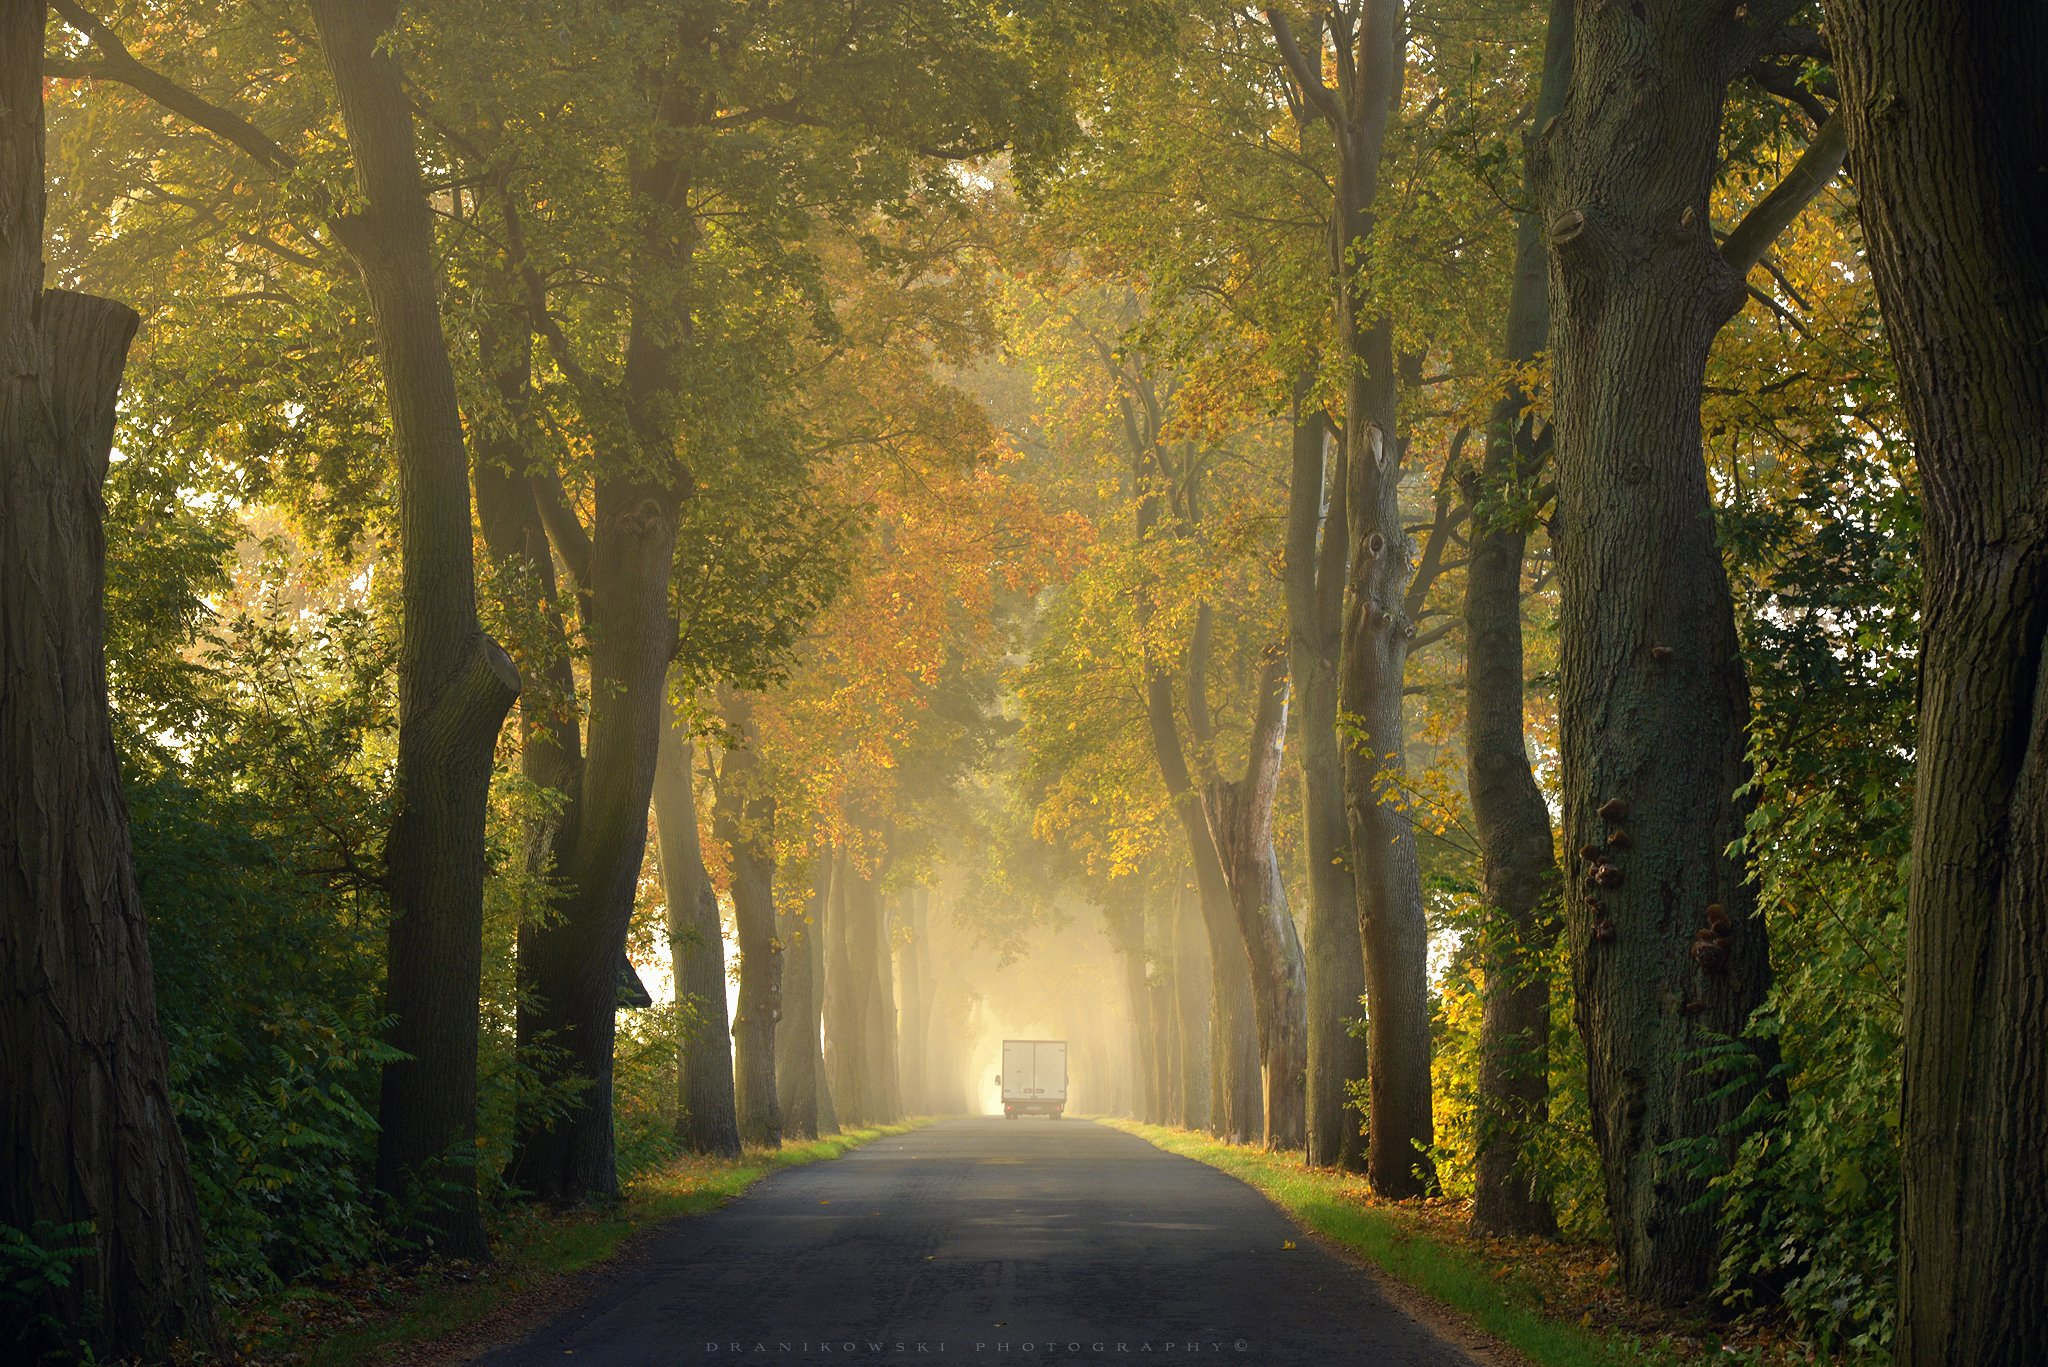 tree tunnel road path foggy mist dranikowski magic autumn fall trees light, Radoslaw Dranikowski